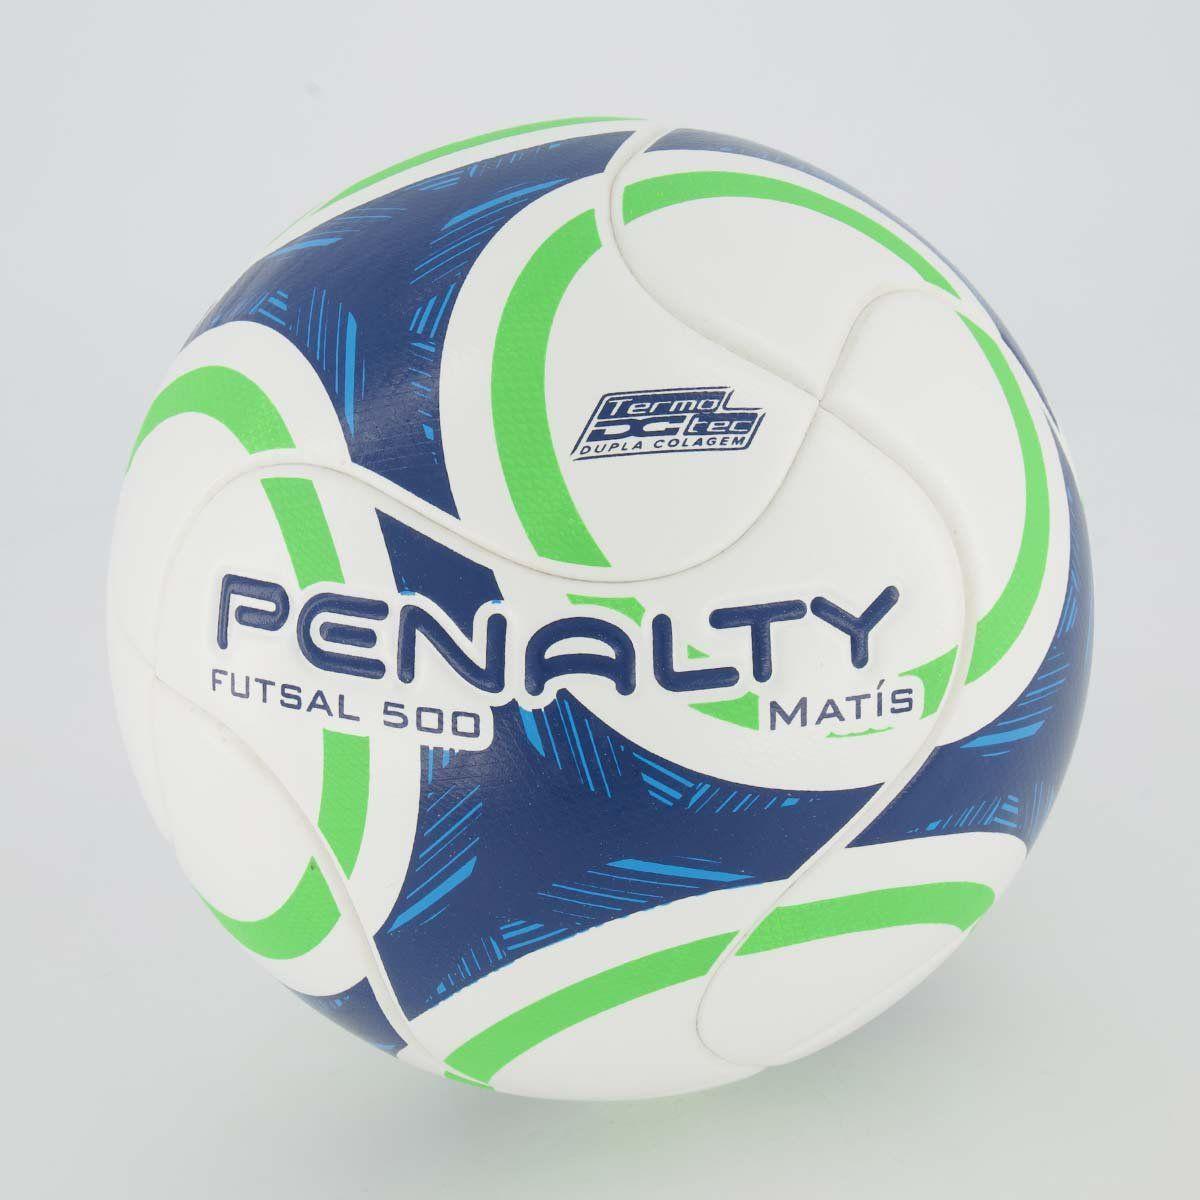 Cupom de desconto Bola Penalty Matís 500 IX Futsal Azul e Verde